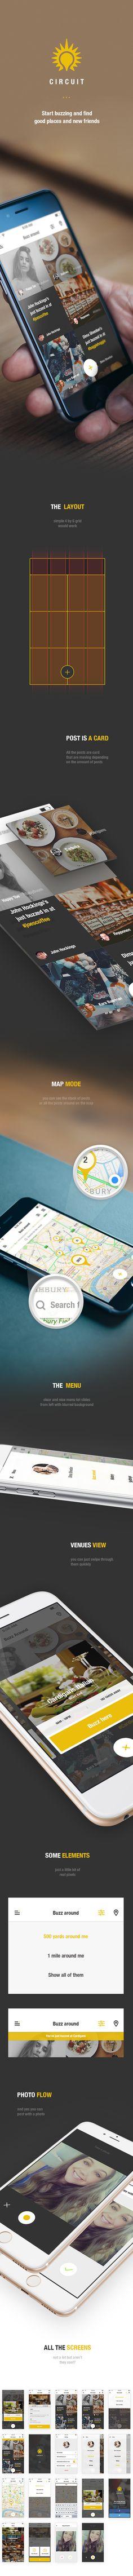 Circuit iOS App on Behance